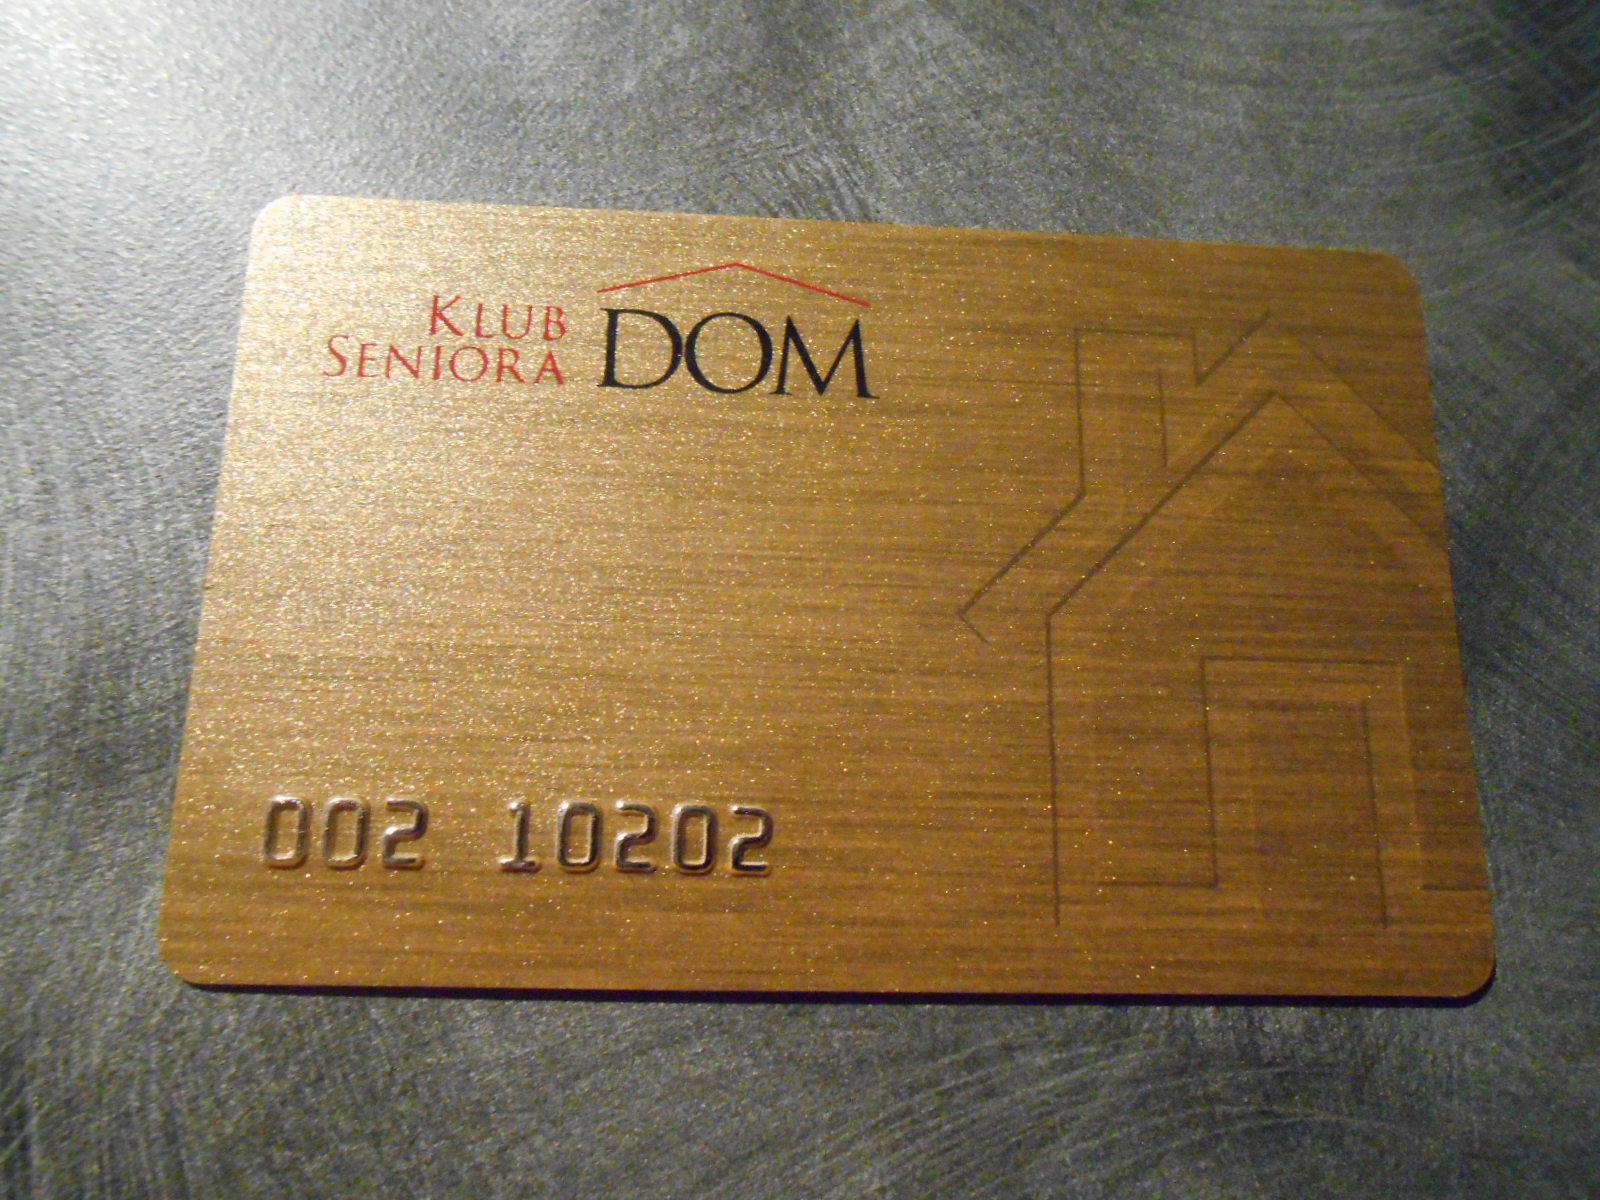 Plastic Card Printing - Membership, Gift Cards - Free Shipping